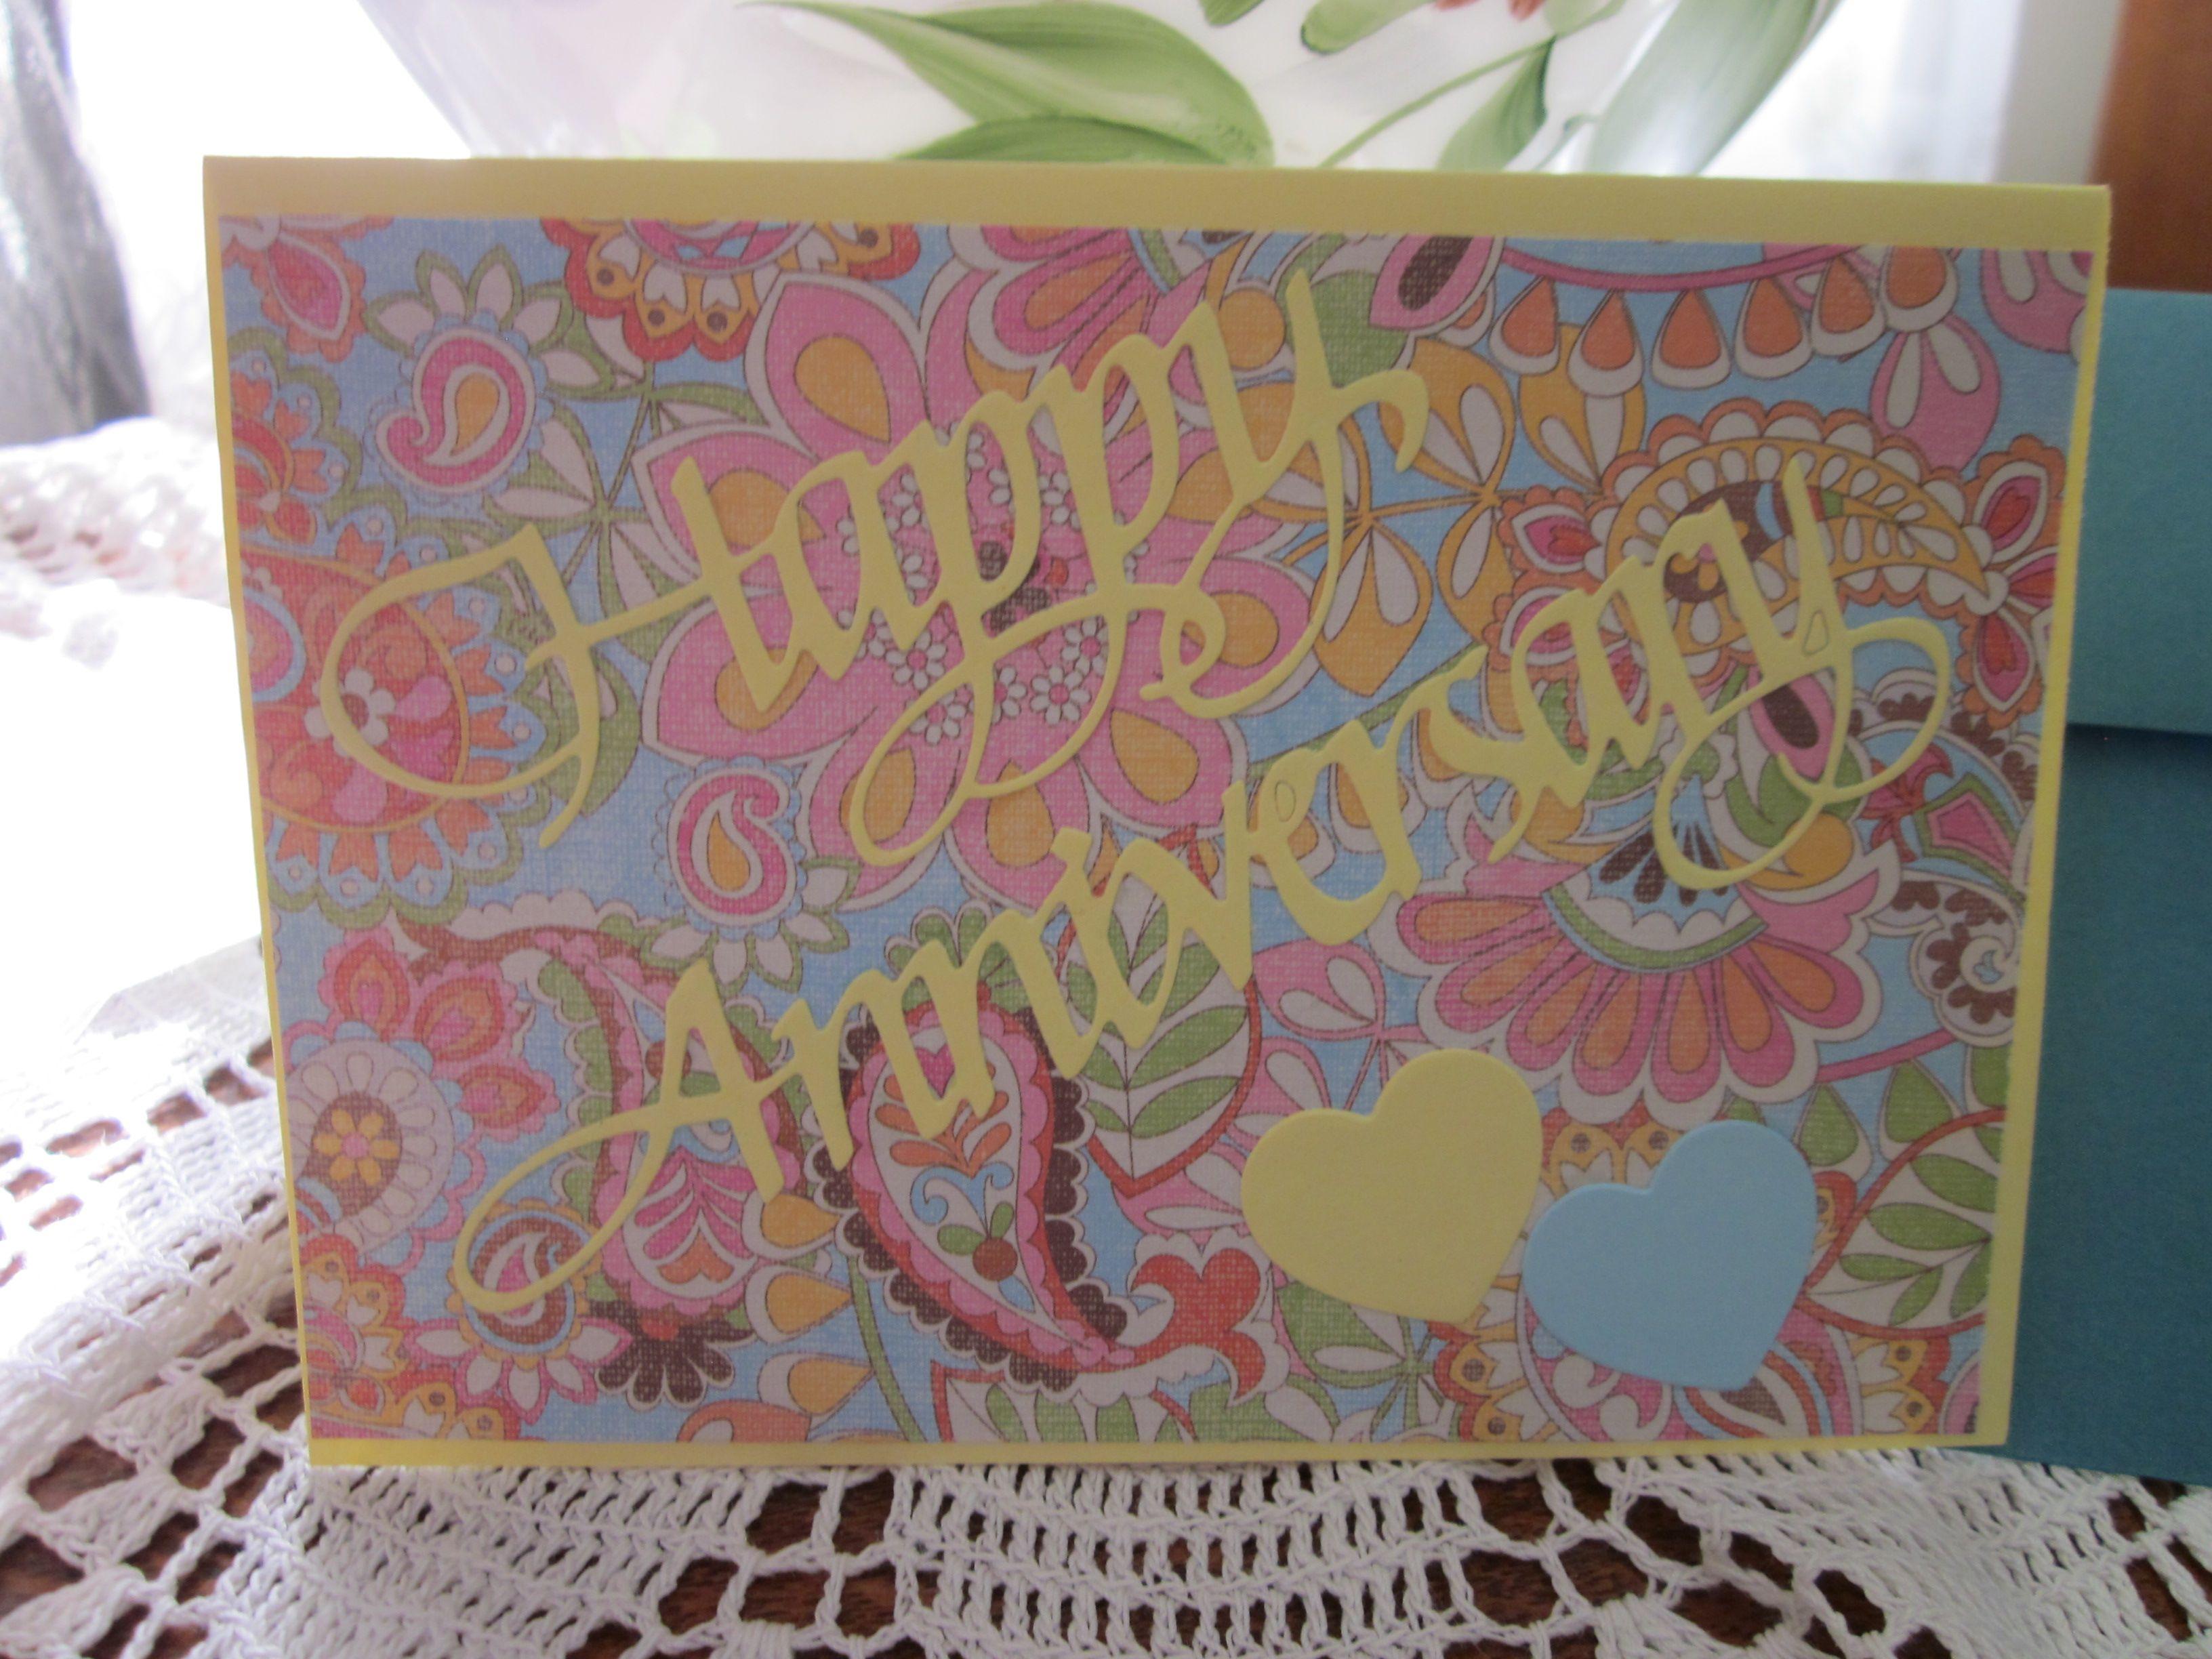 happy anniversary cardbright yellows and paisley